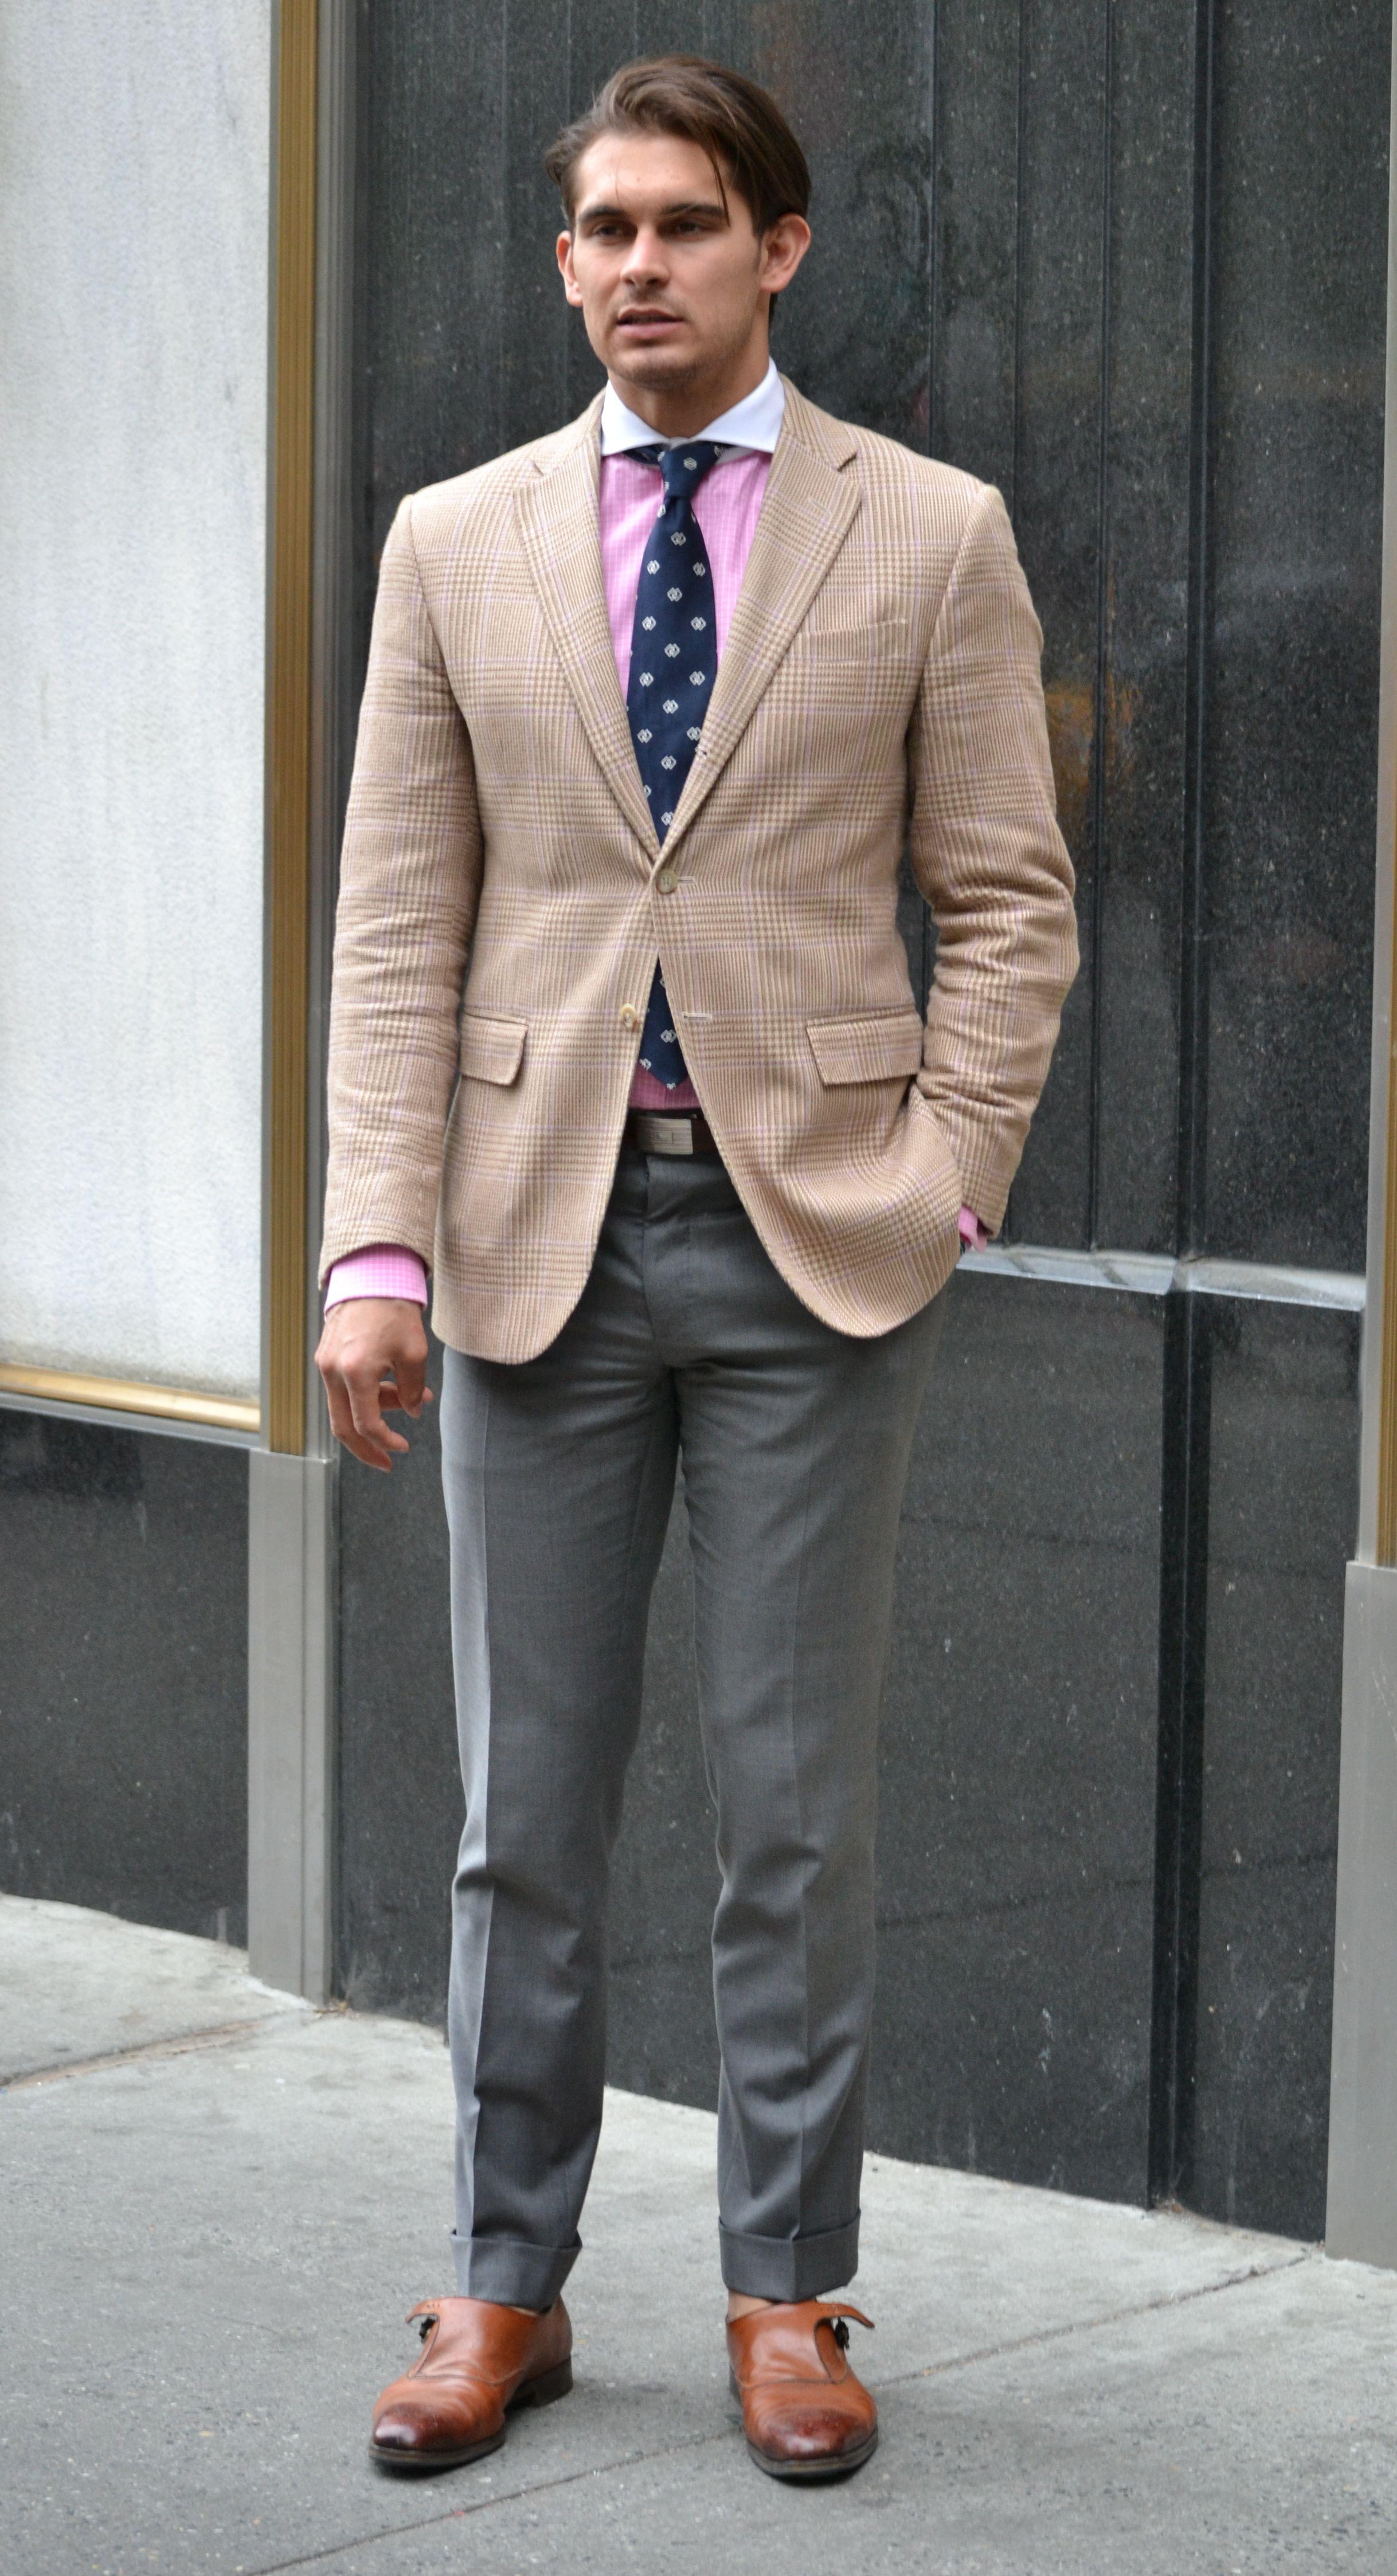 khaki jacket gray pants Google Search Mens outfits